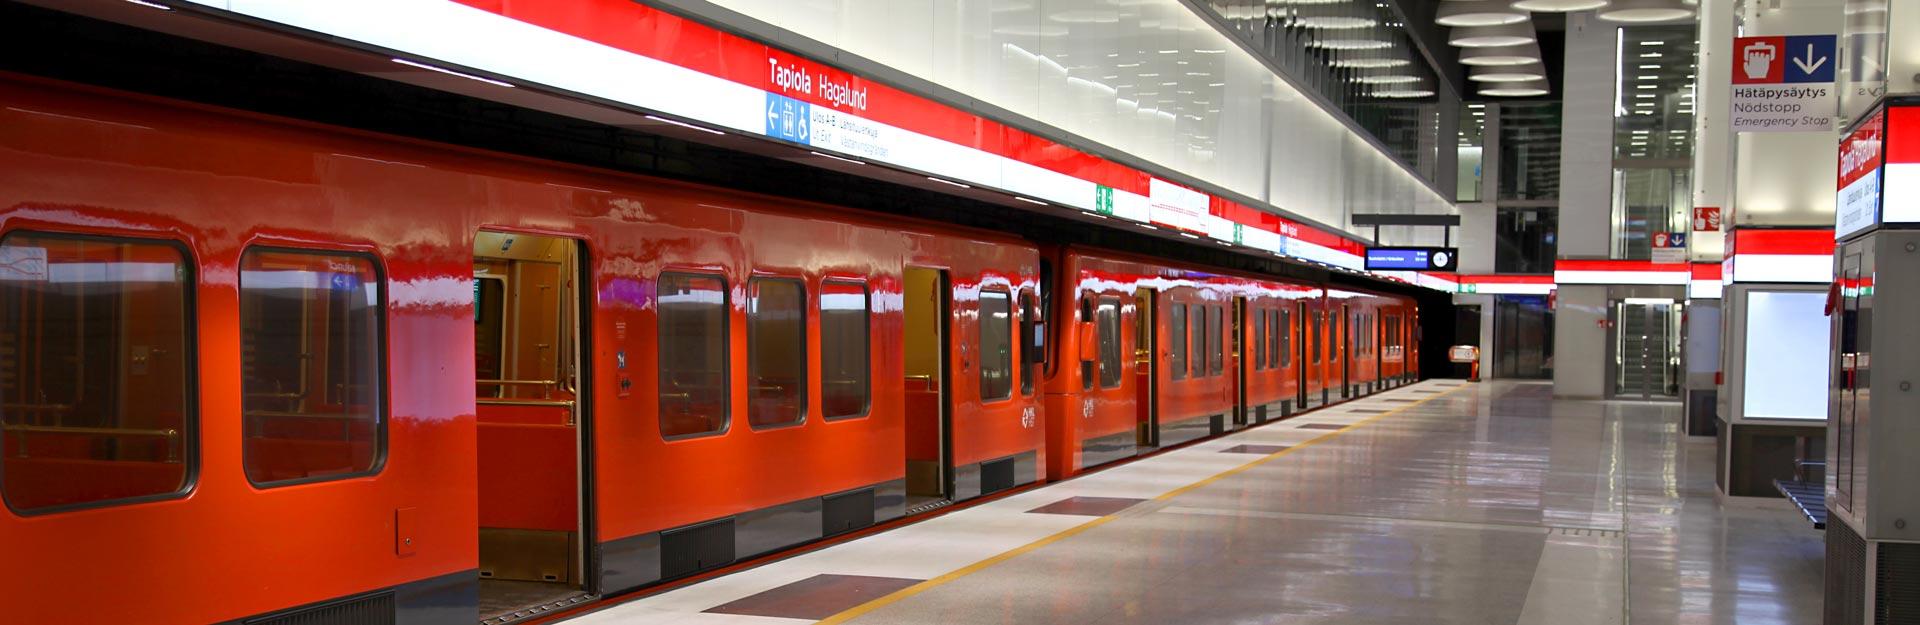 En tunnelbana vid Hagalunds metrostation.